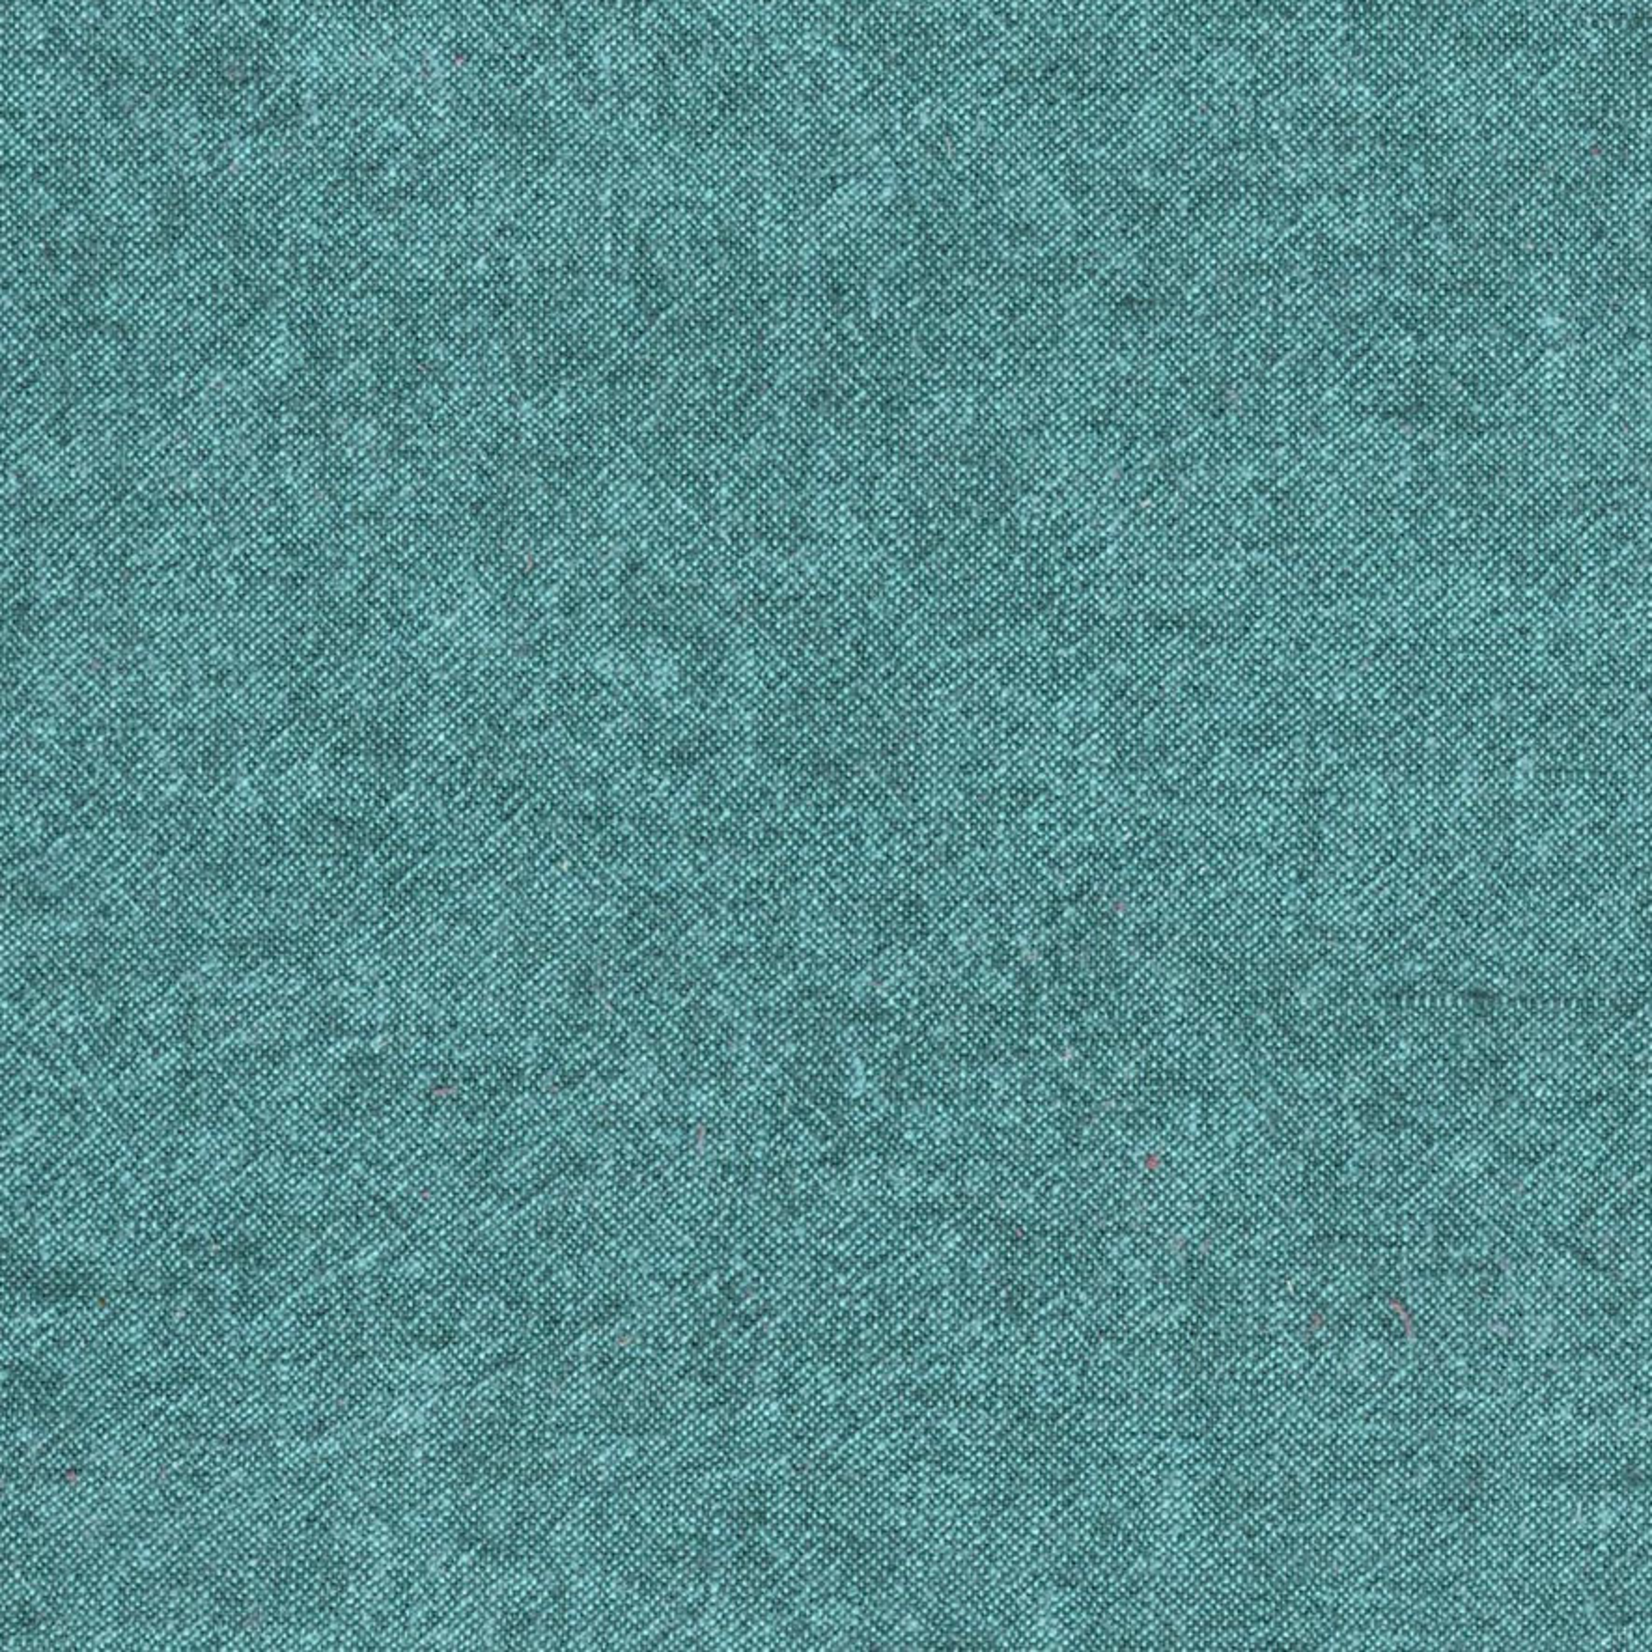 Annie Sloan Annie Sloan Aubusson and Provence Linen Fabric per m